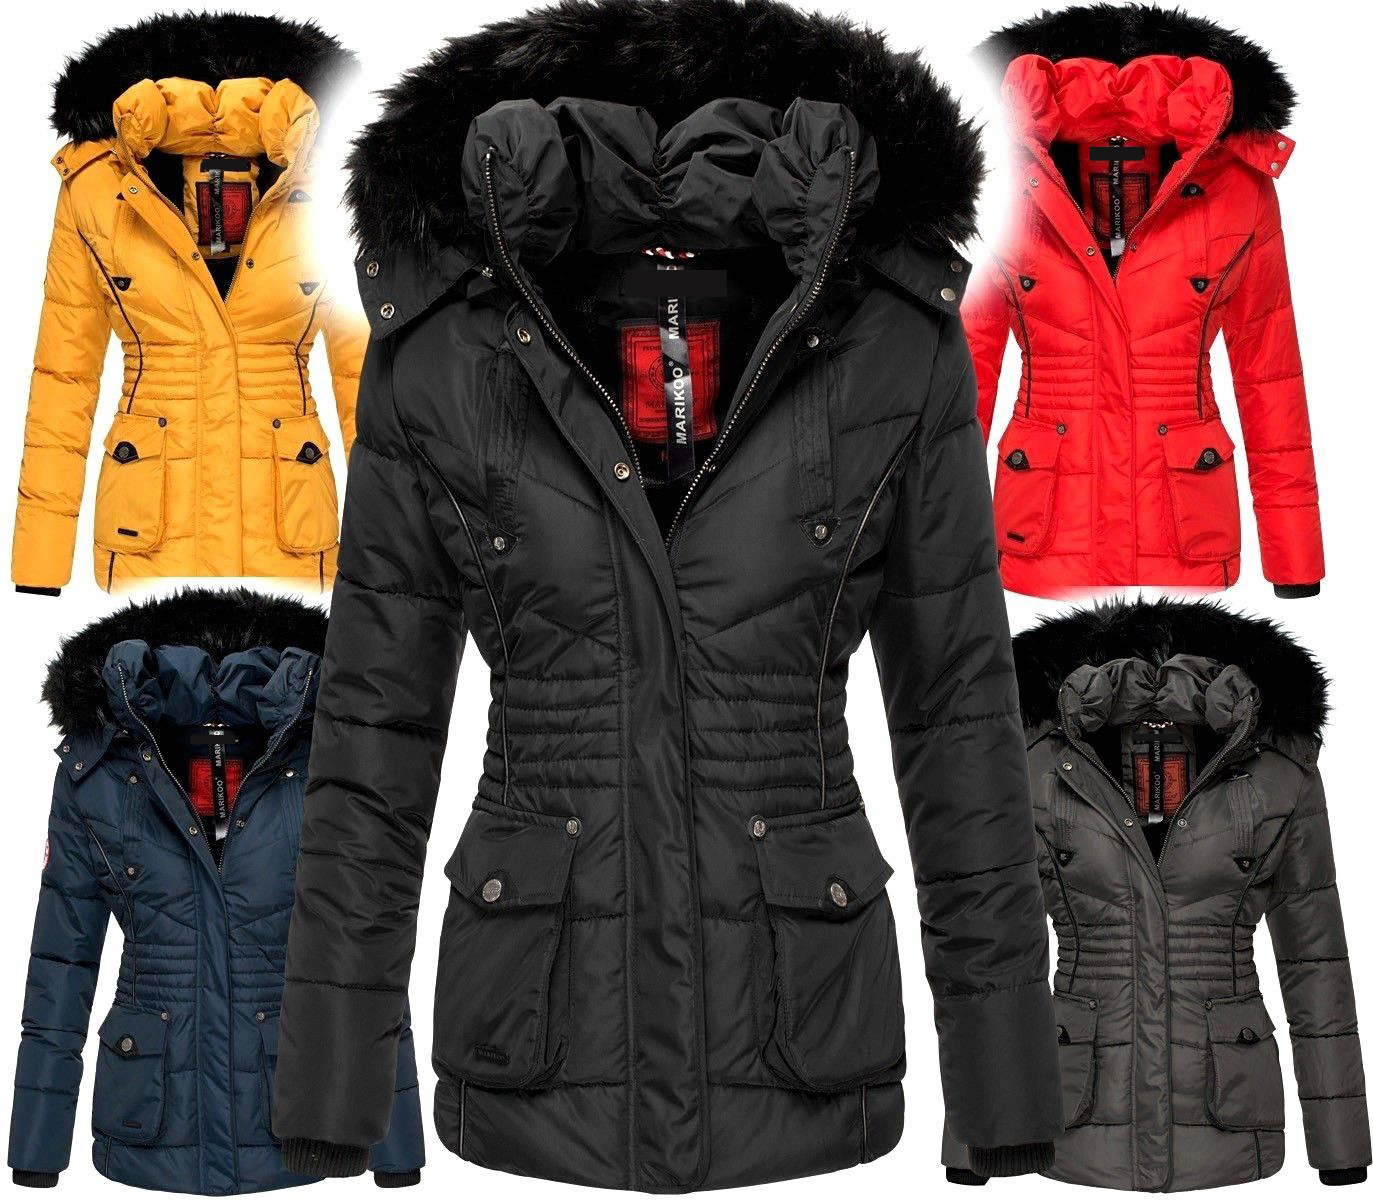 Marikoo Ladies Very Warm Winter Jacket Parka Winter Coat Teddy Fur Vanilla stitching   eBay